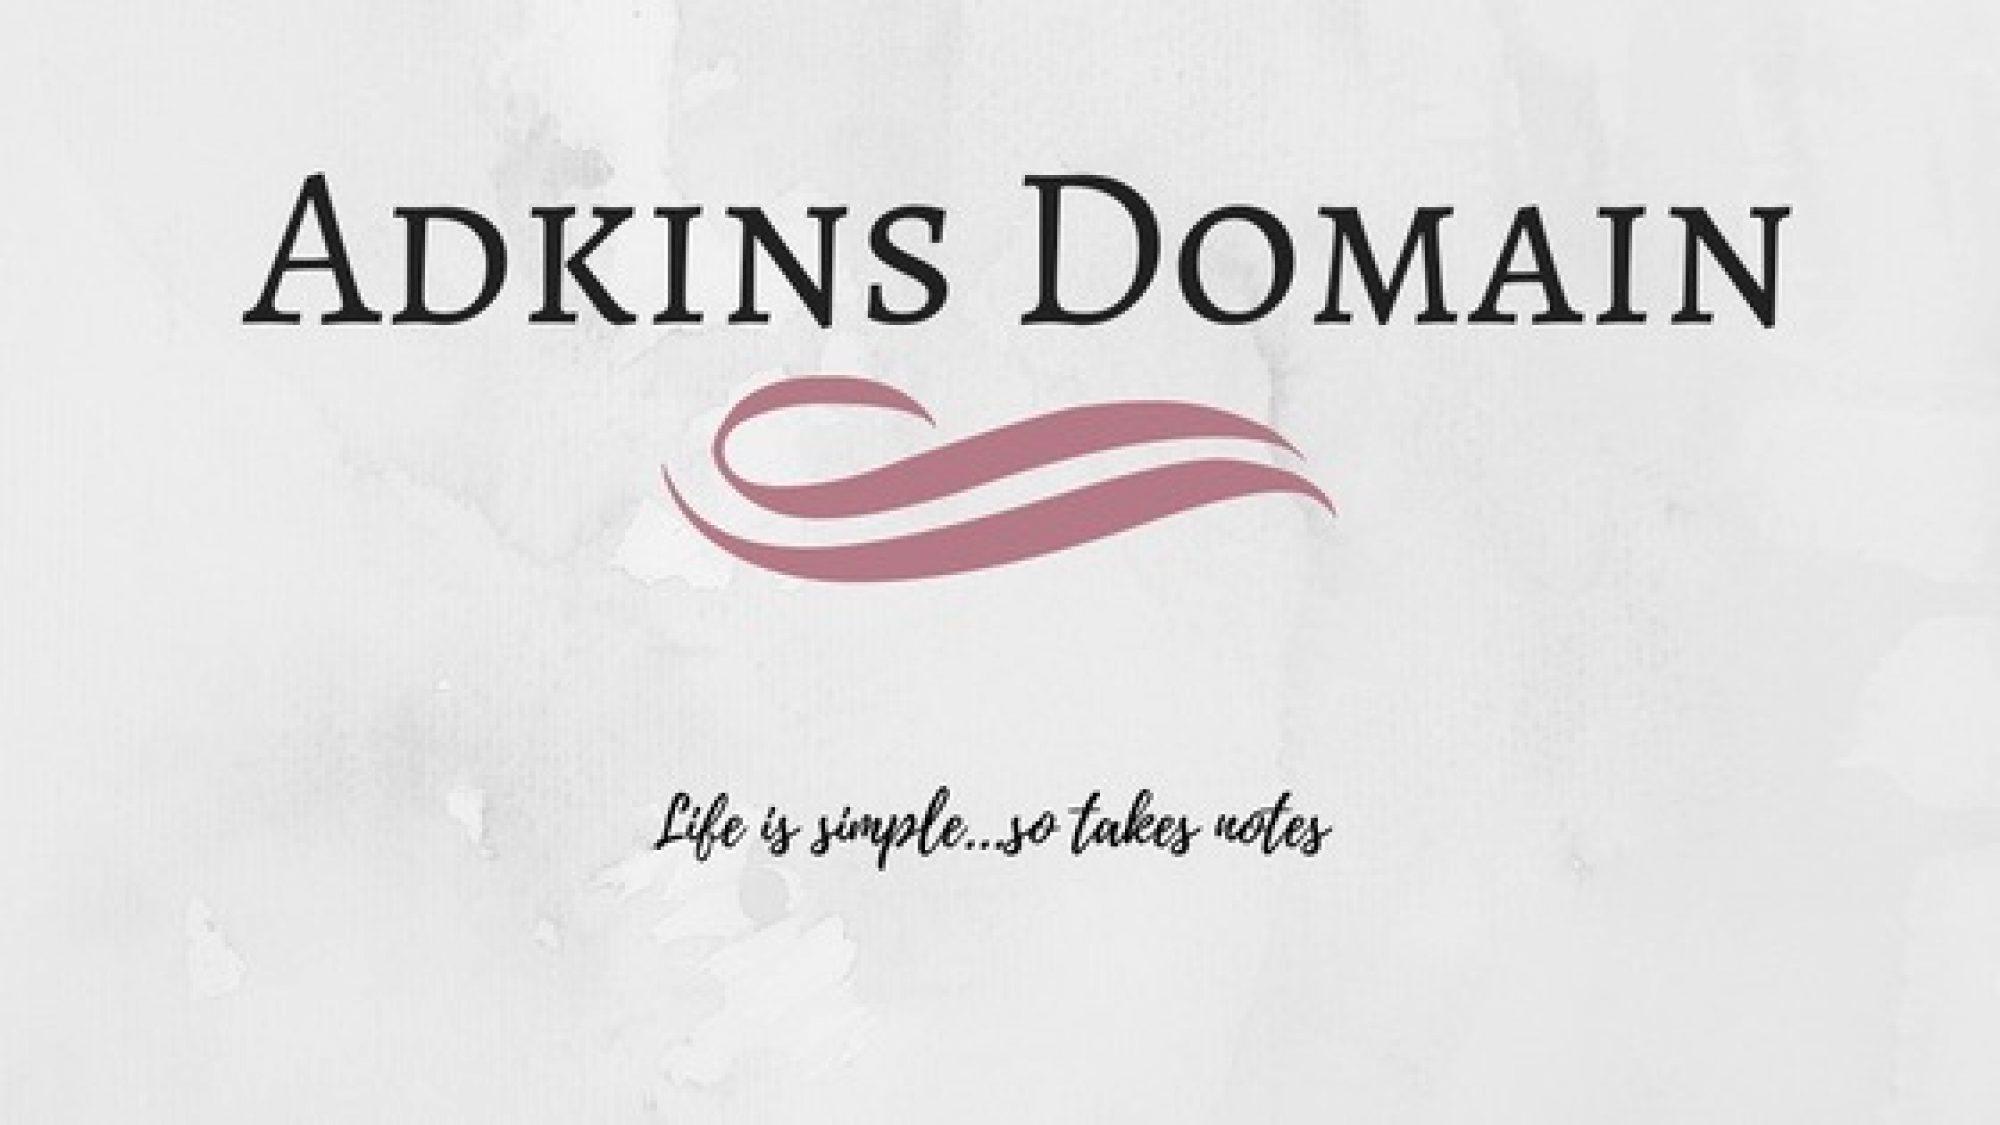 Adkins Domain